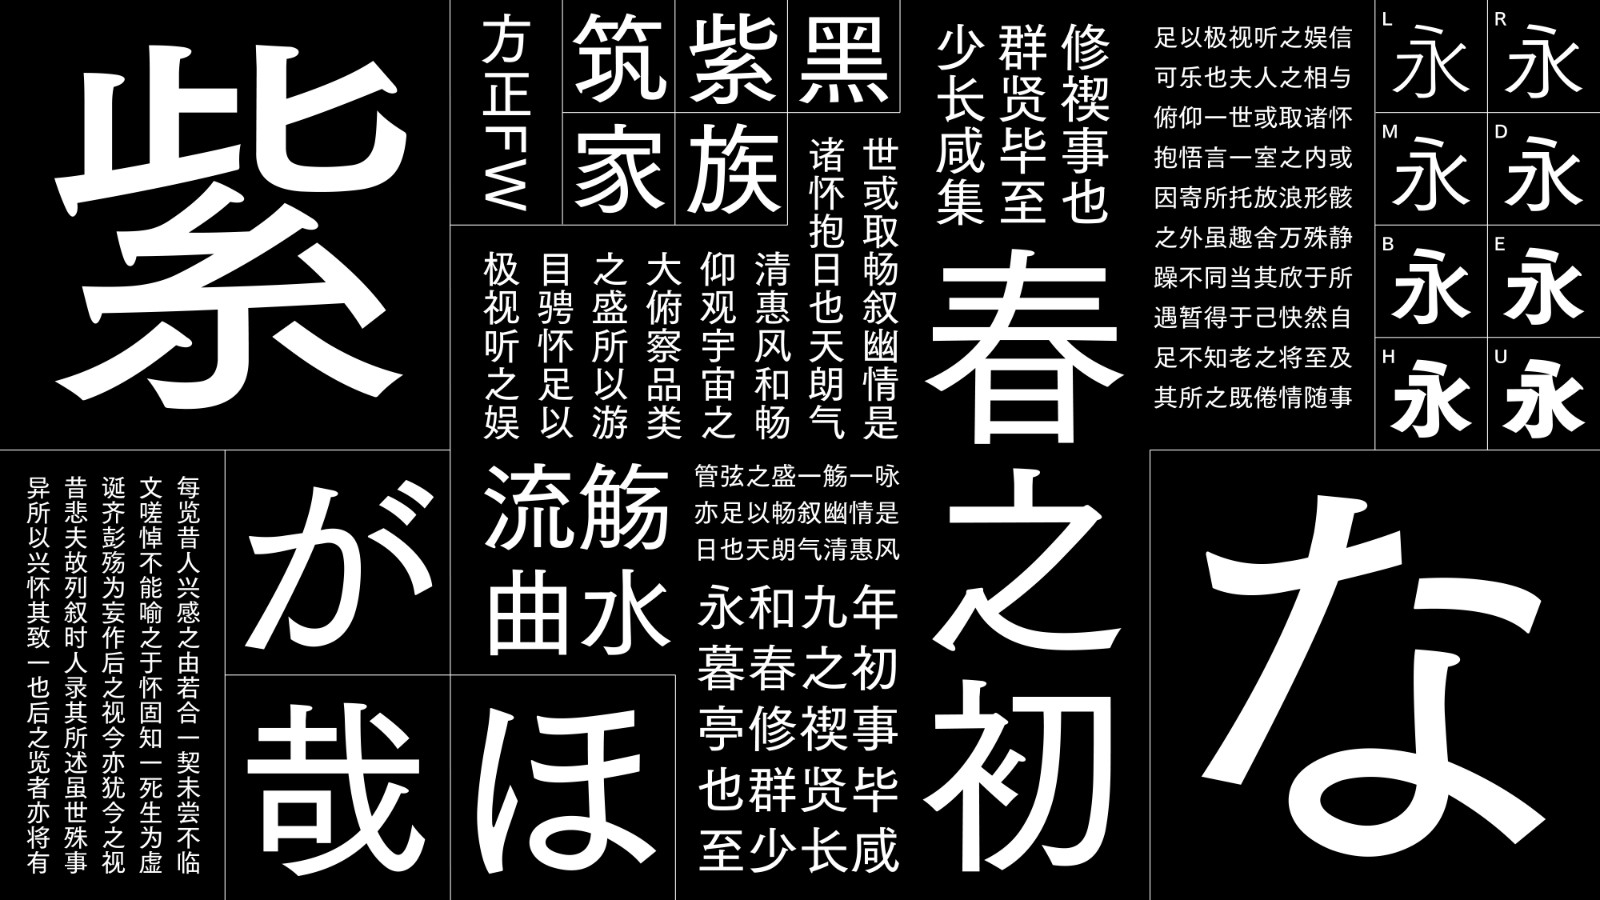 https://ft-bk1.oss-cn-zhangjiakou.aliyuncs.com/Public/Uploads/img/n_content_20201210175725_8459.jpg